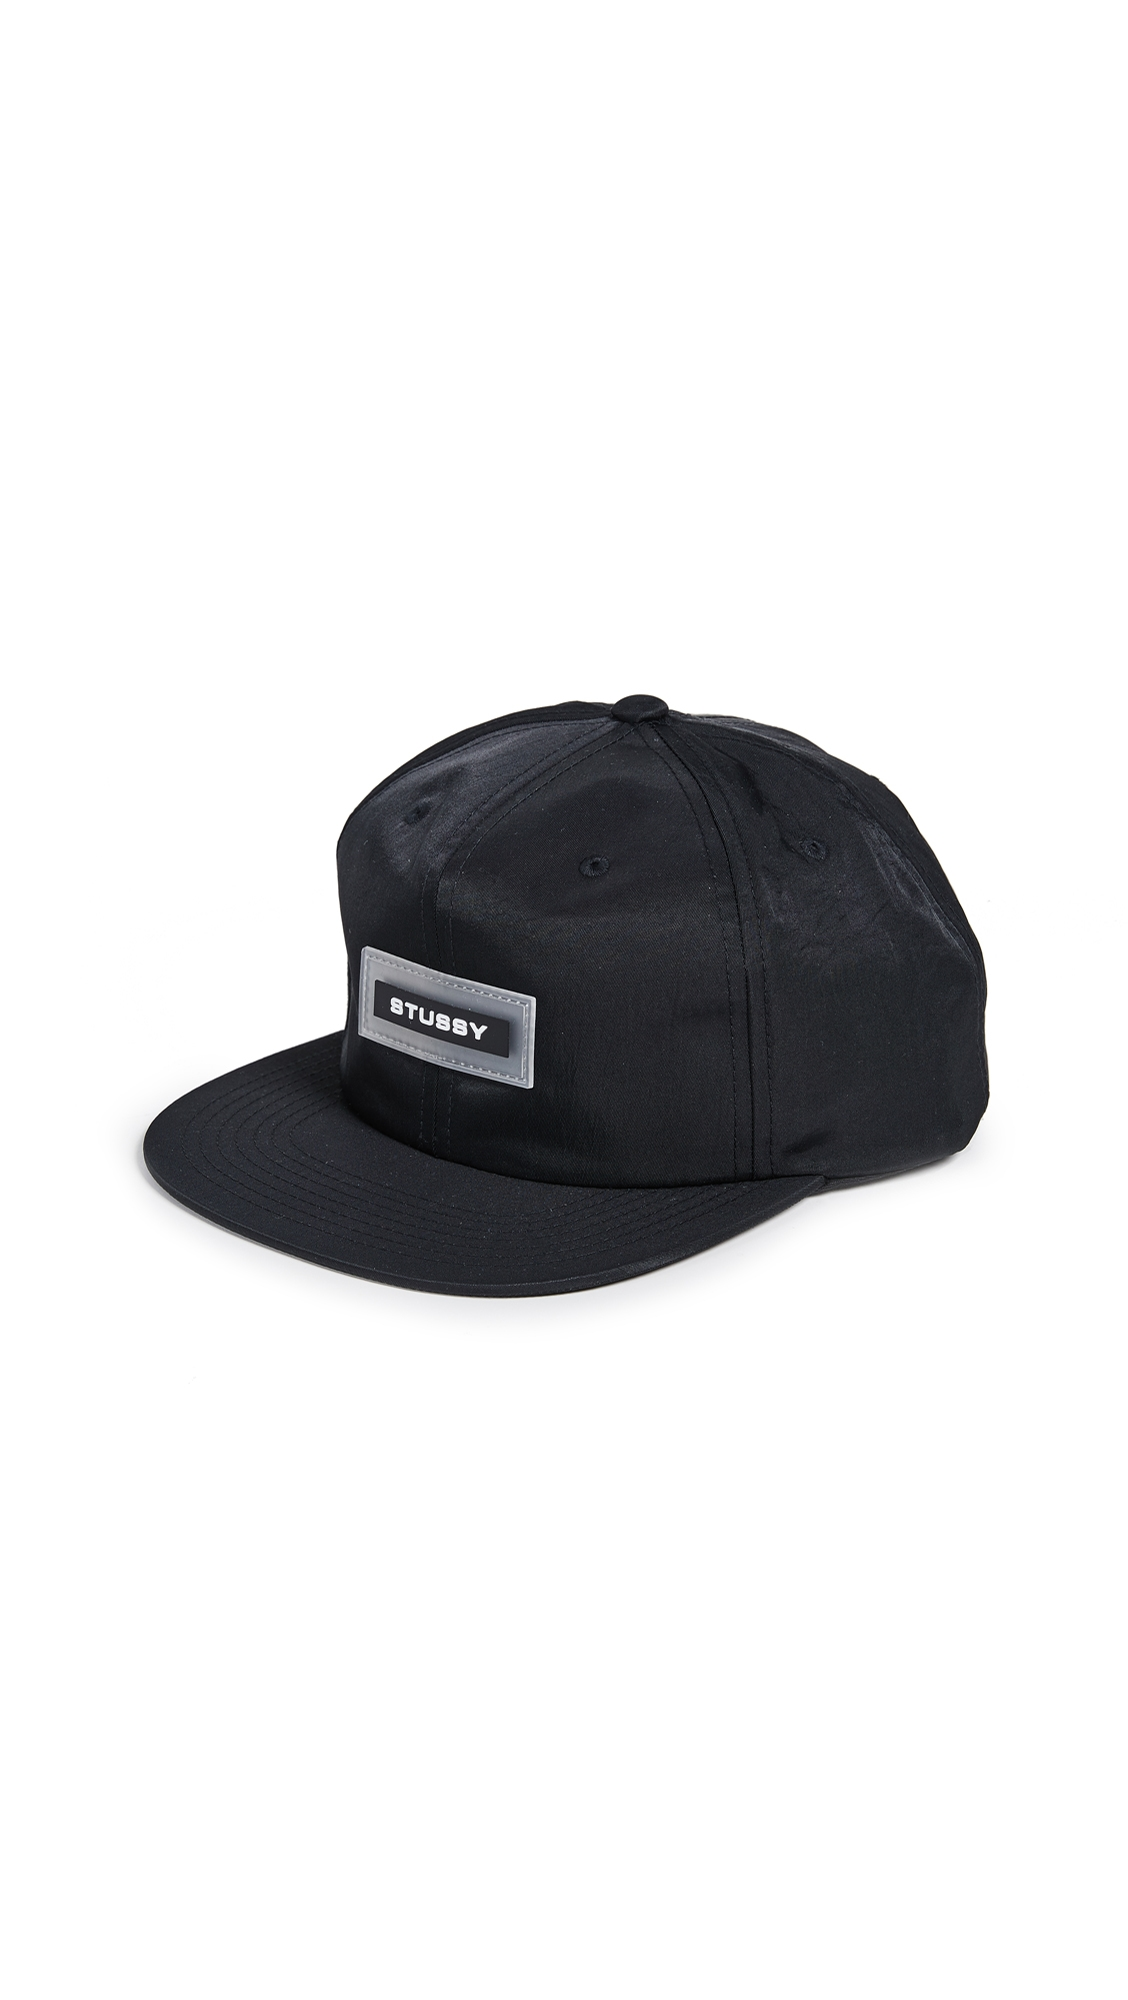 177c35ecf26 STUSSY Nylon Twill Snapback Cap